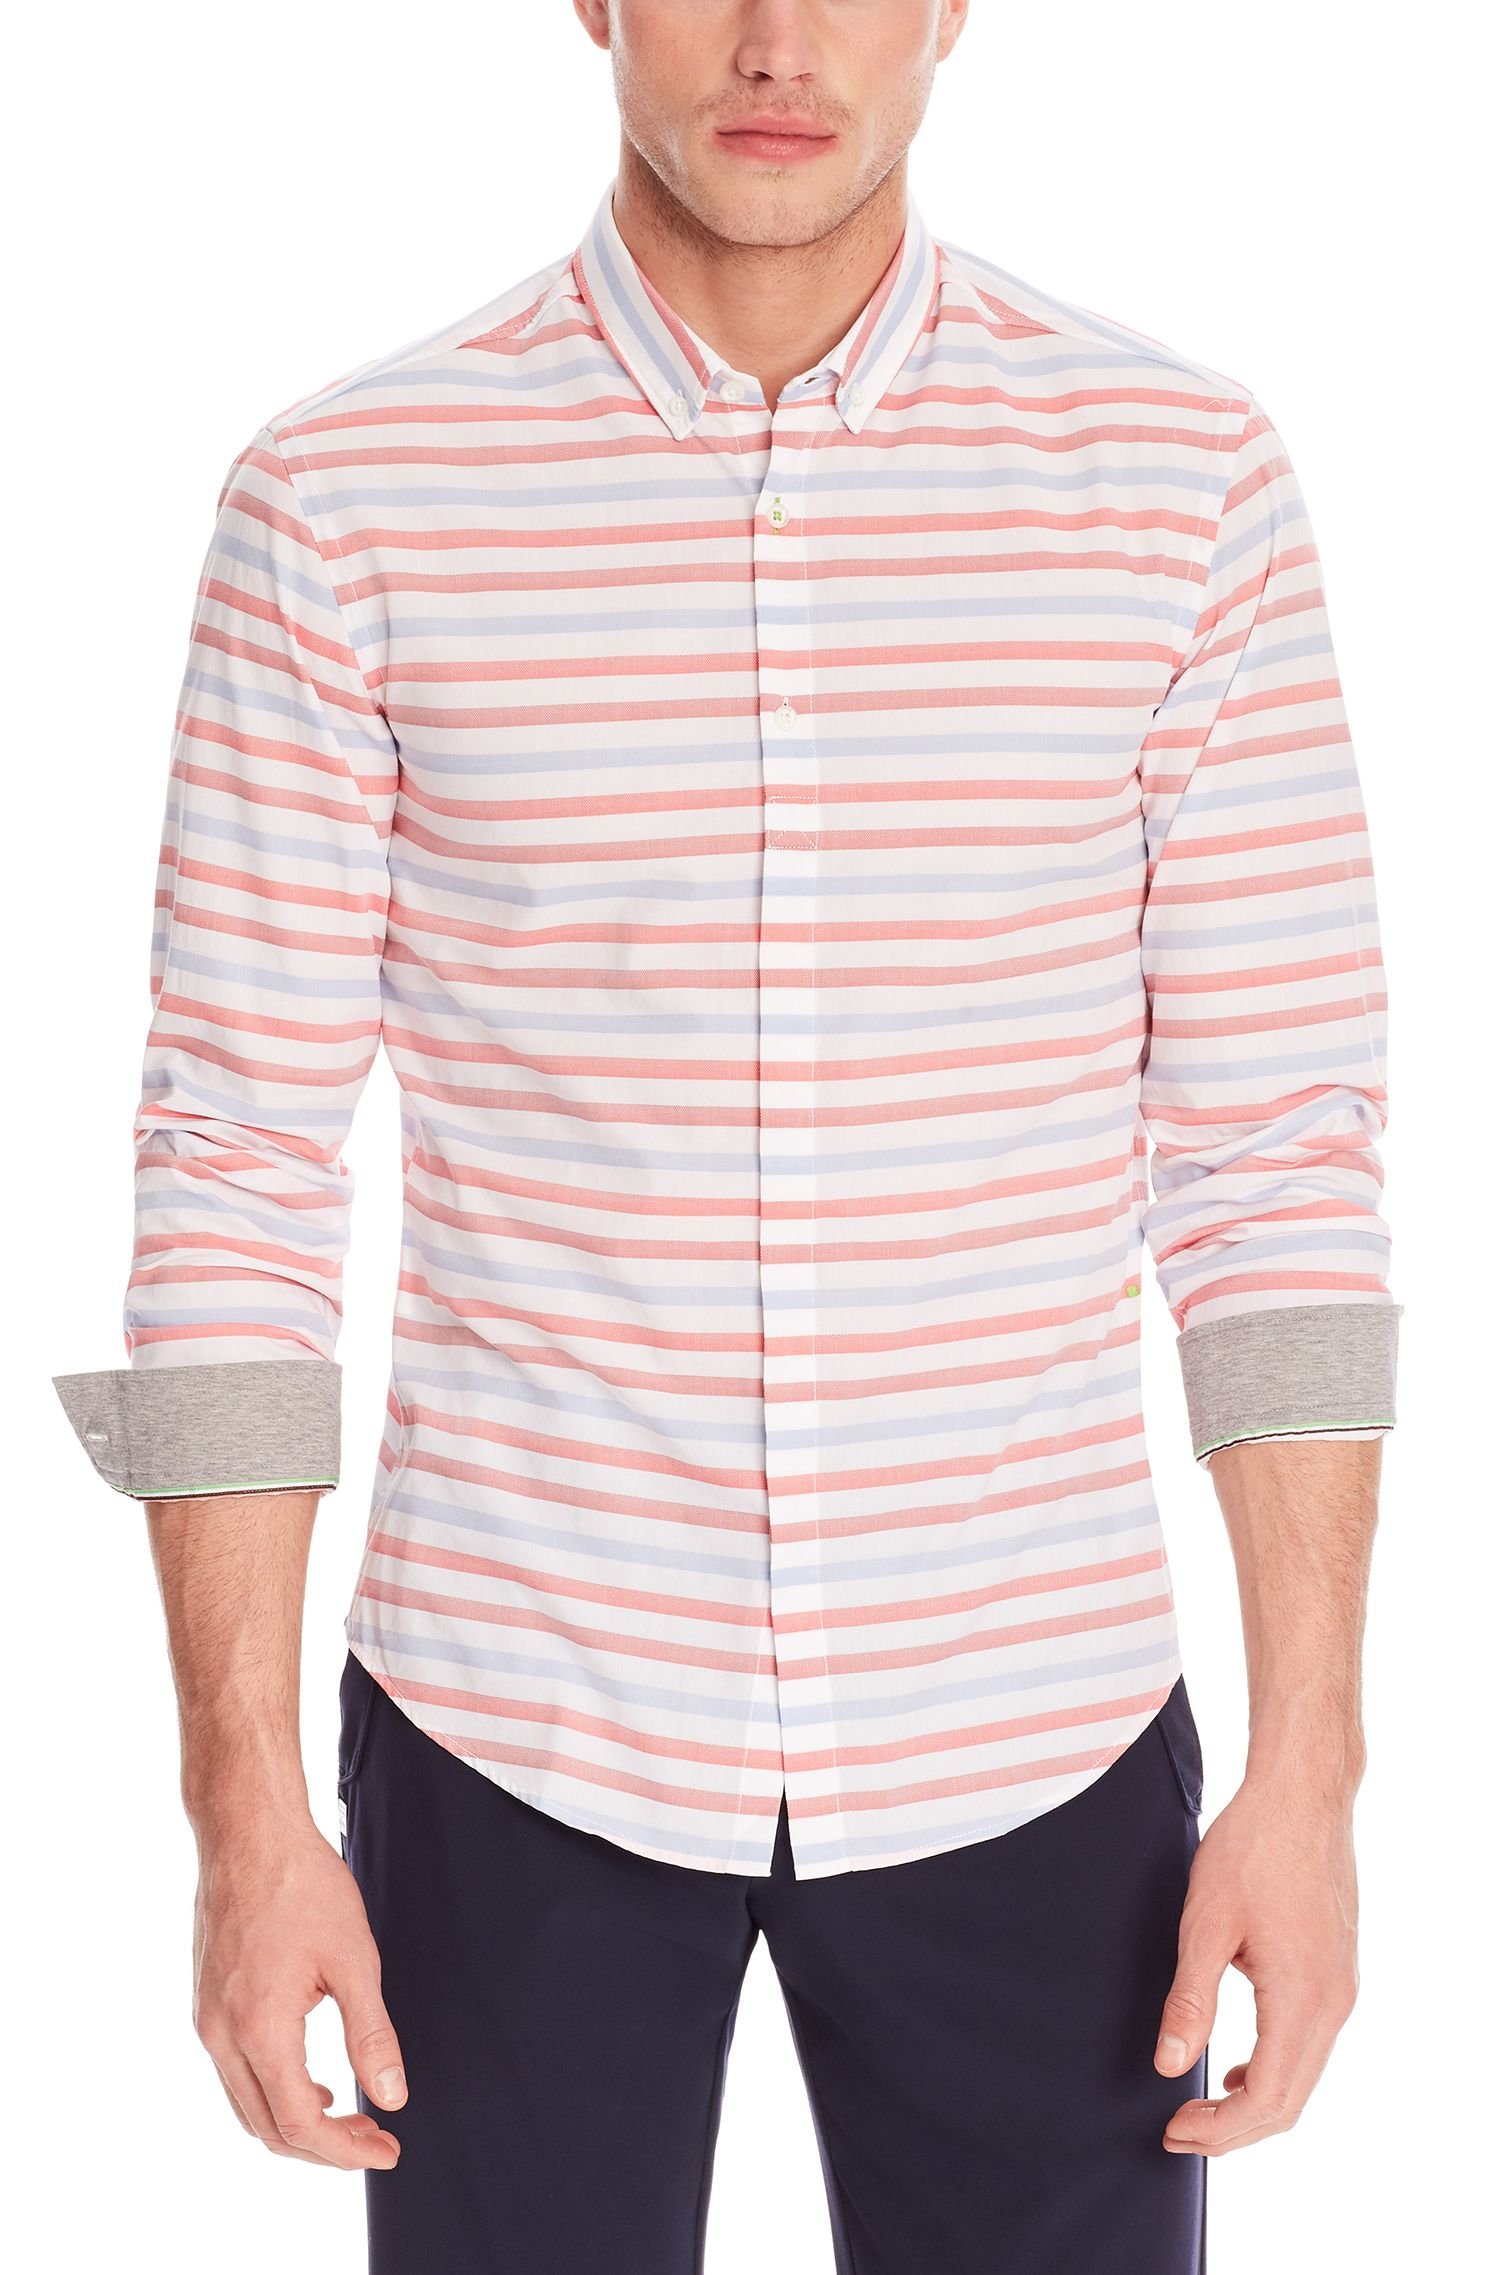 'Belfiore' | Slim Fit, Cotton Button Down Shirt